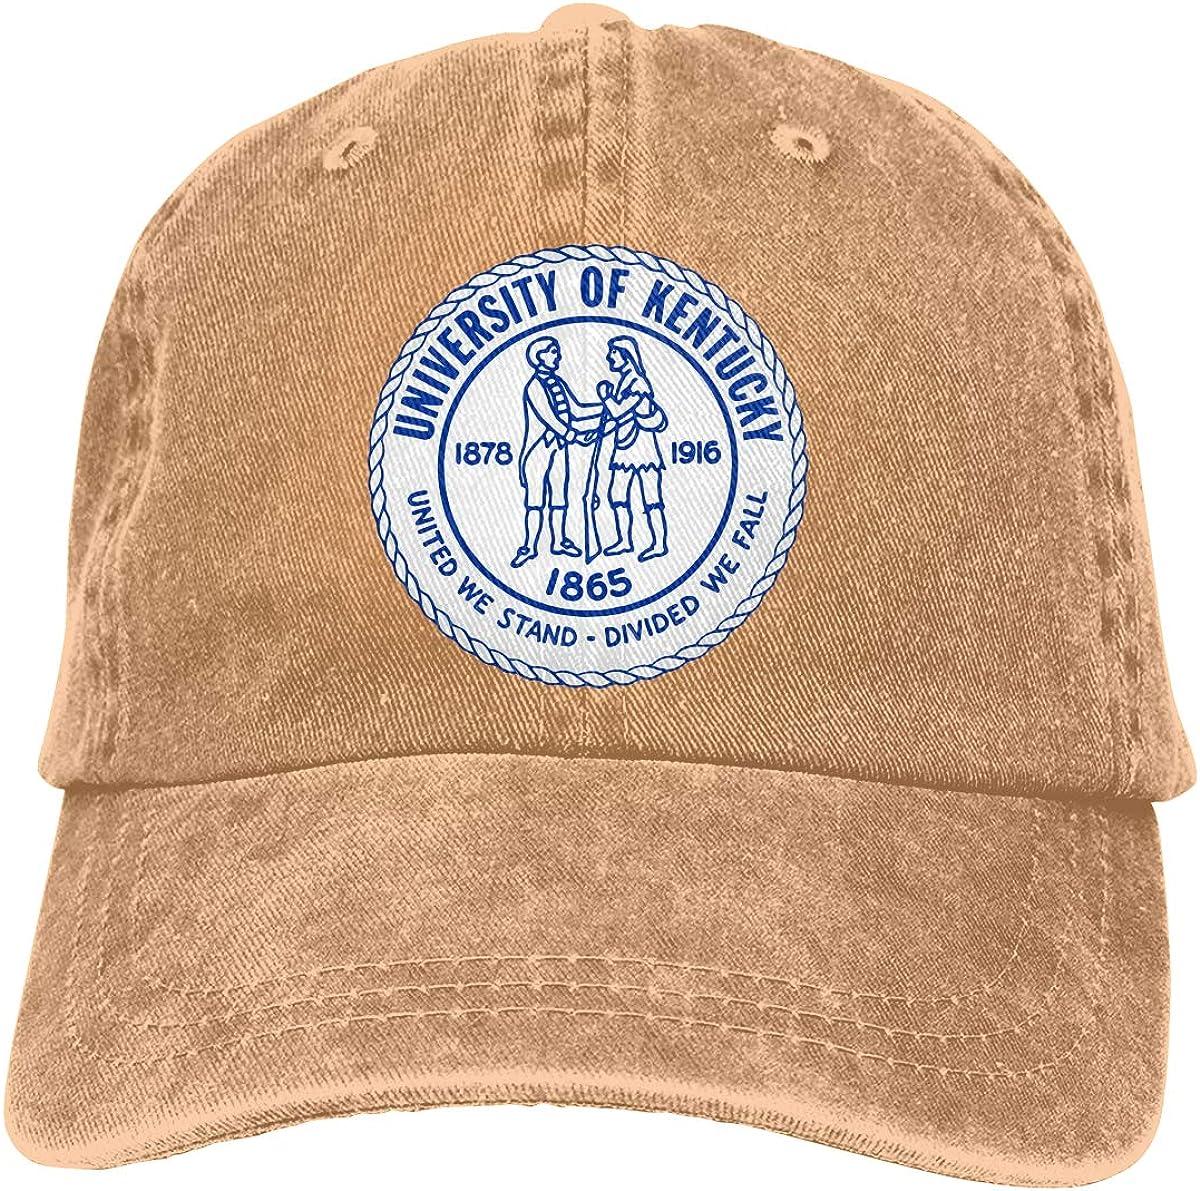 UK Commemorate Casquette Cap Vintage Adjustable Unisex Baseball Hat